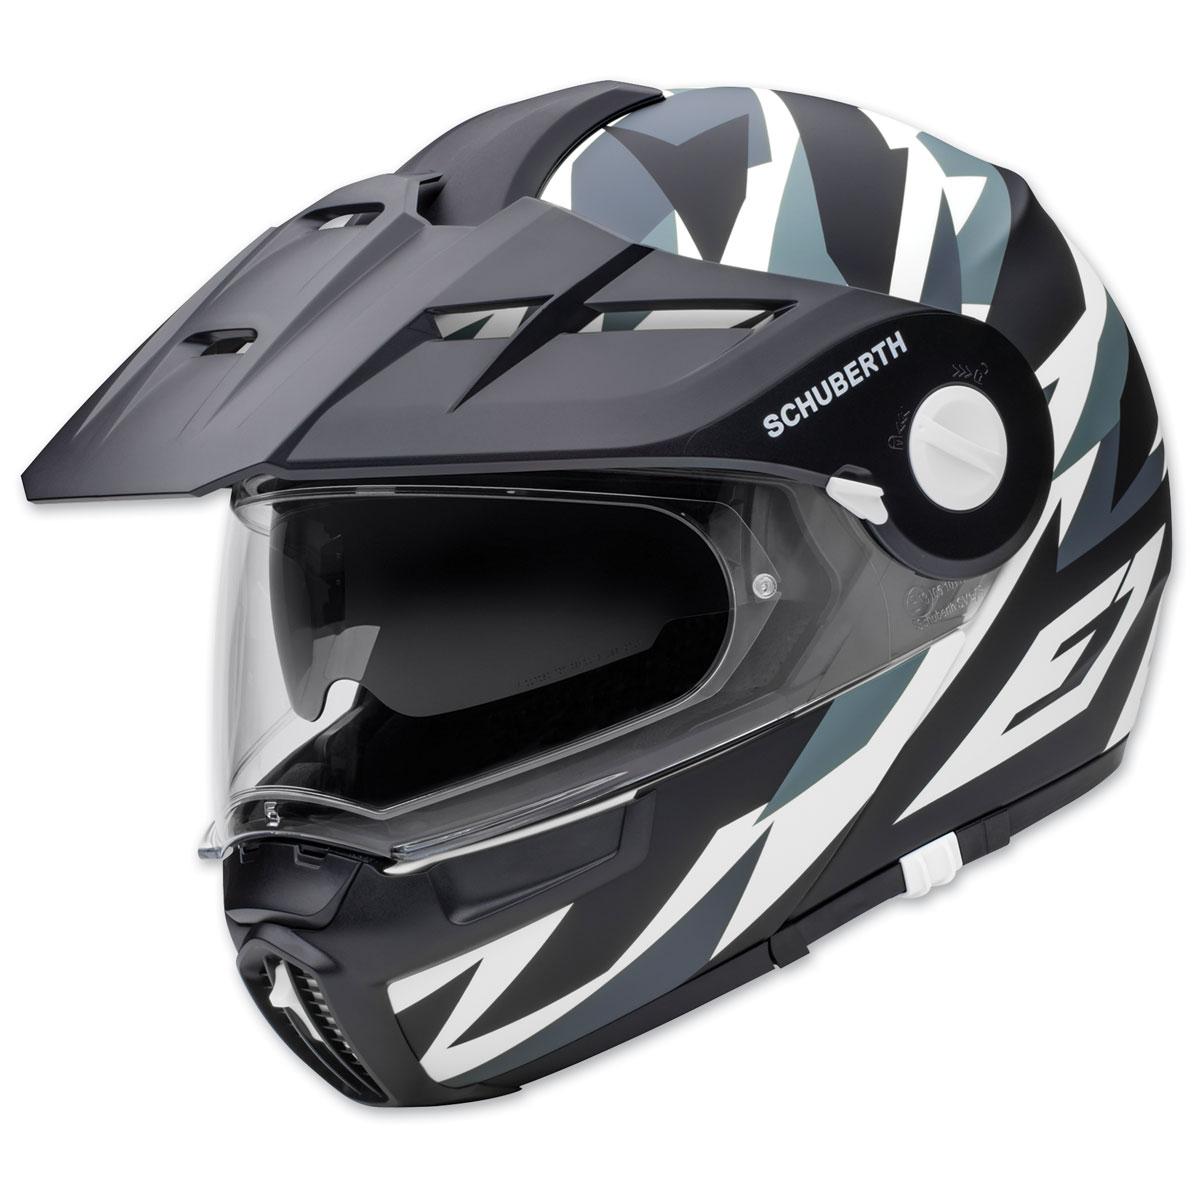 Schuberth E1 Rival Gray Modular Helmet